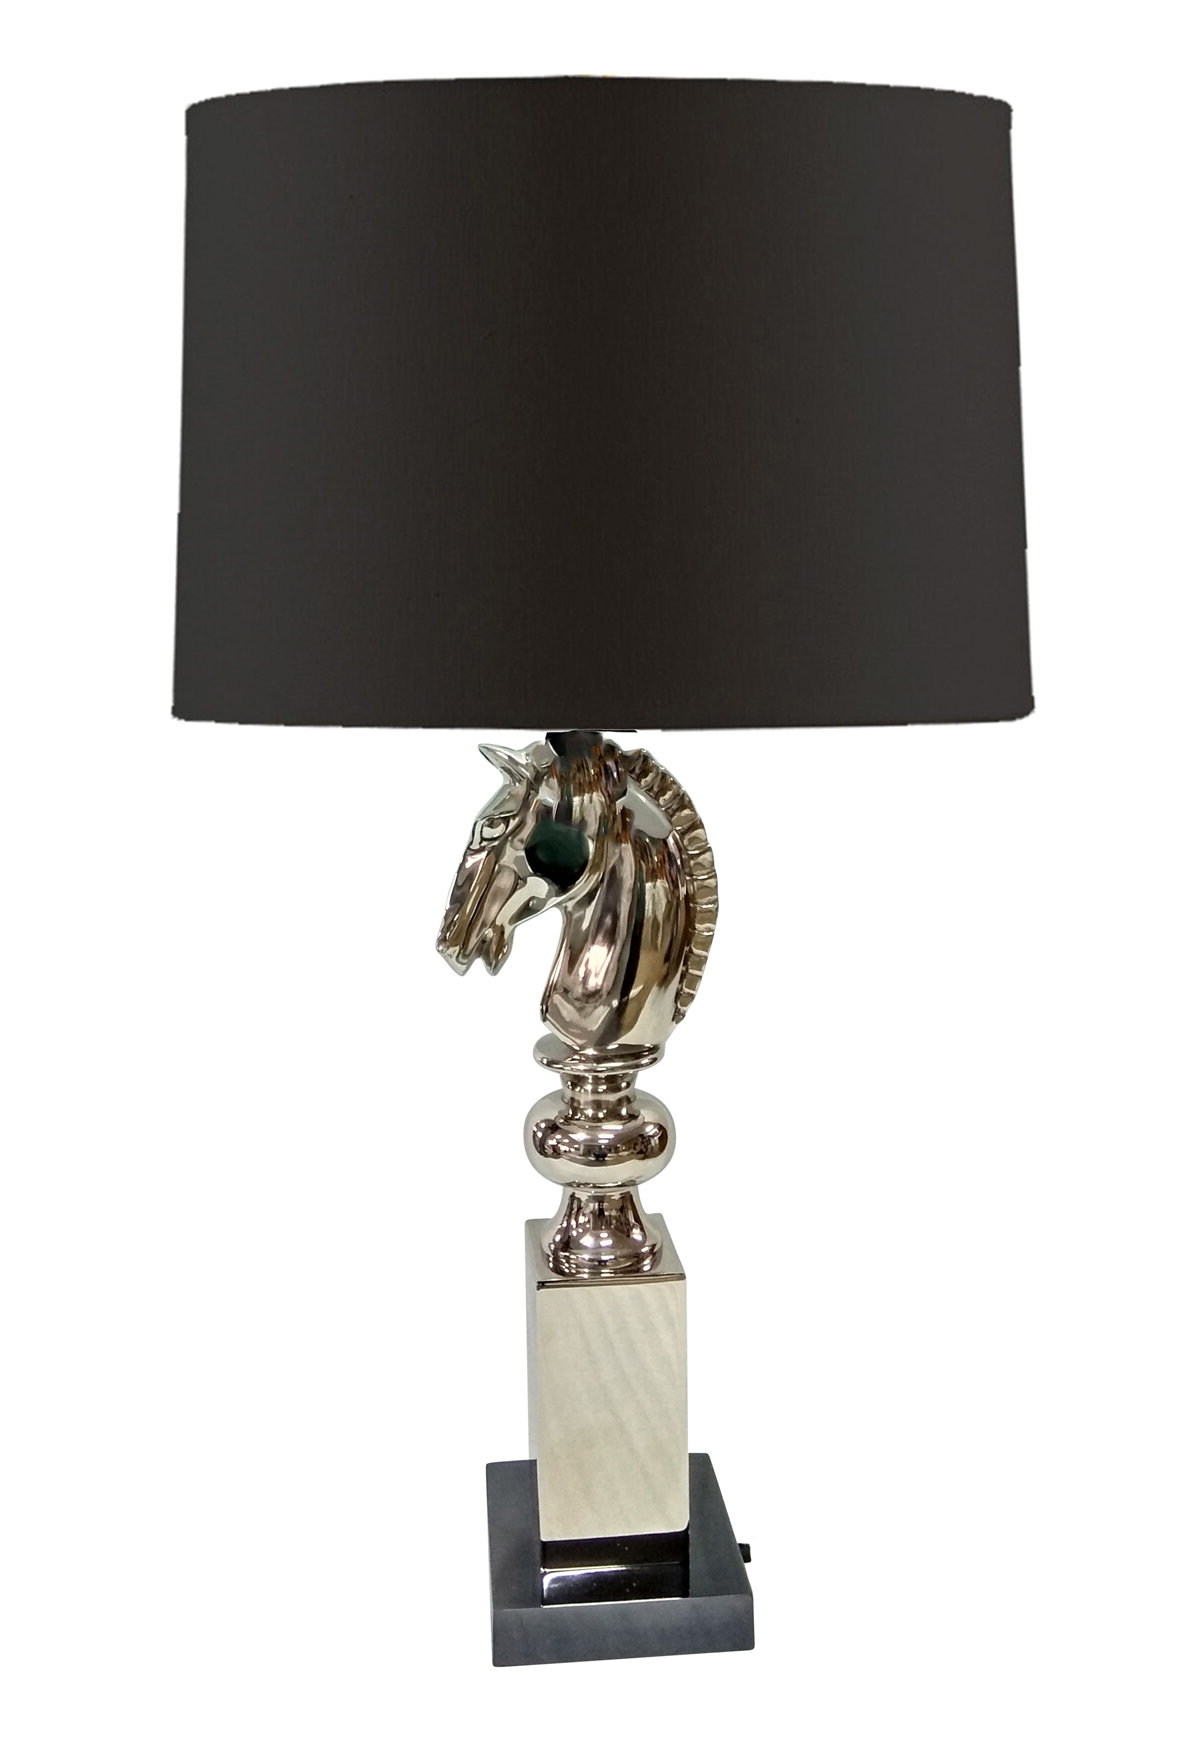 "Brubaker 31"" Table Lamp Regarding Widely Used Brubaker Market Umbrellas (View 3 of 20)"